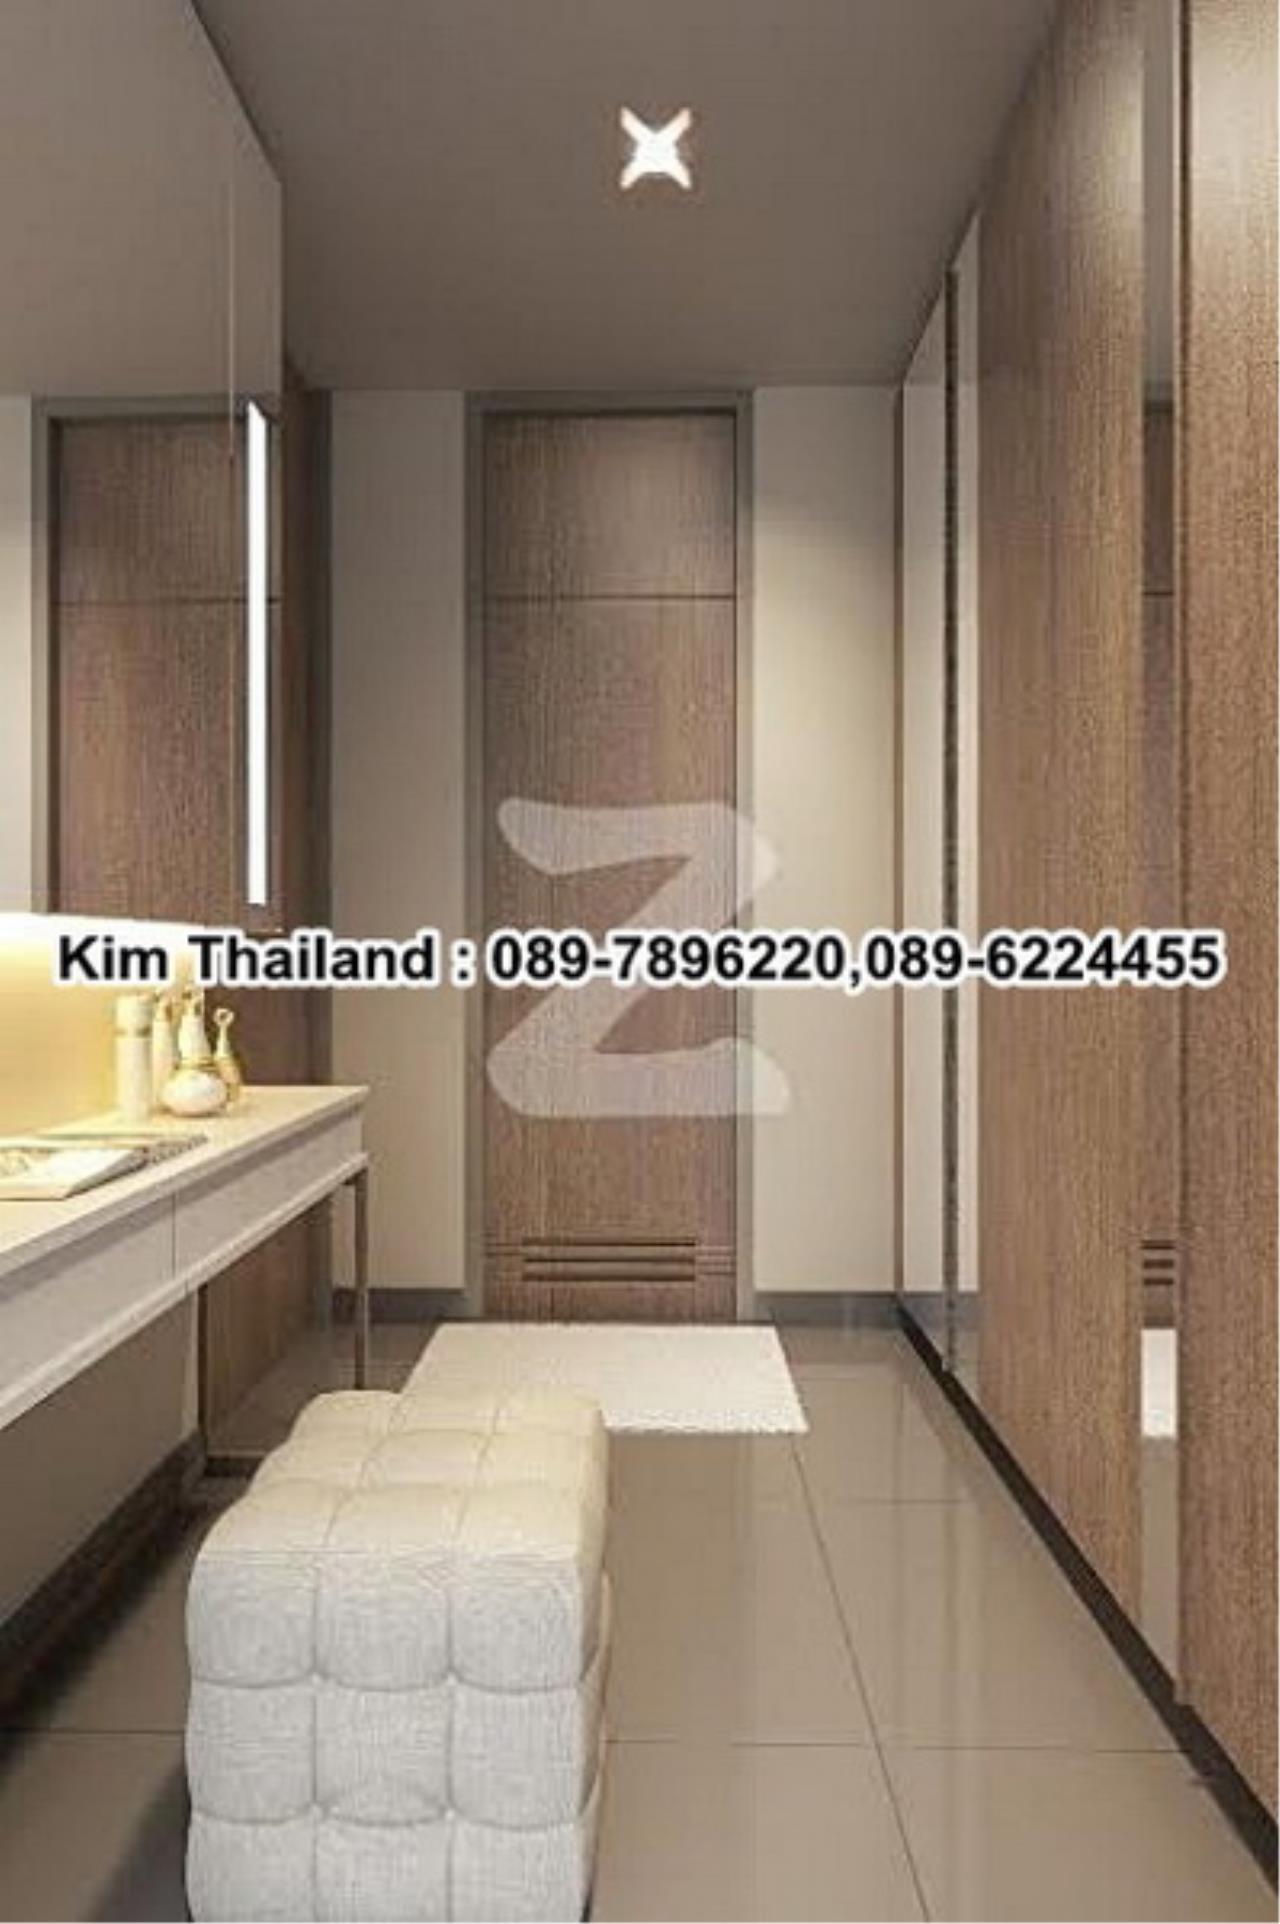 BKKcondorental Agency's For sale, Condo Noble Ploenchit , 49 s.qm. 1 bathroom. Price 14.5 Million baht. 2